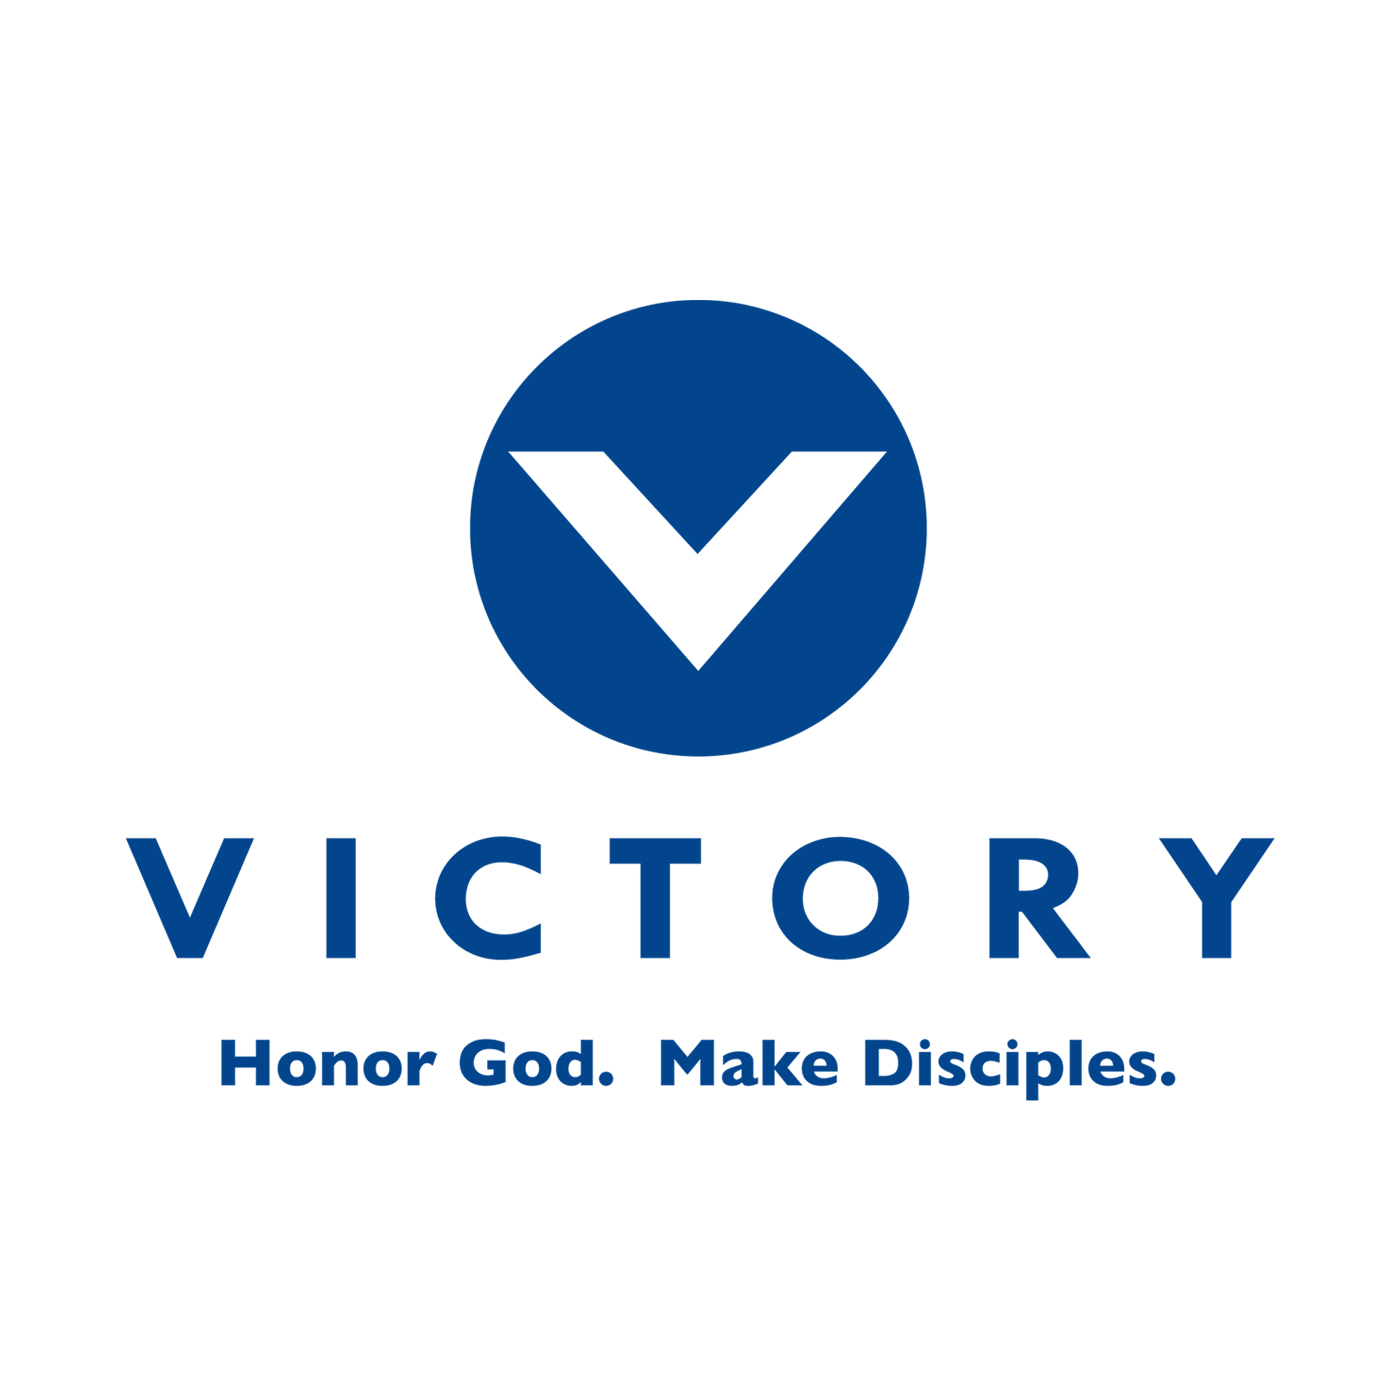 Victory - Honor God. Make Disciples.